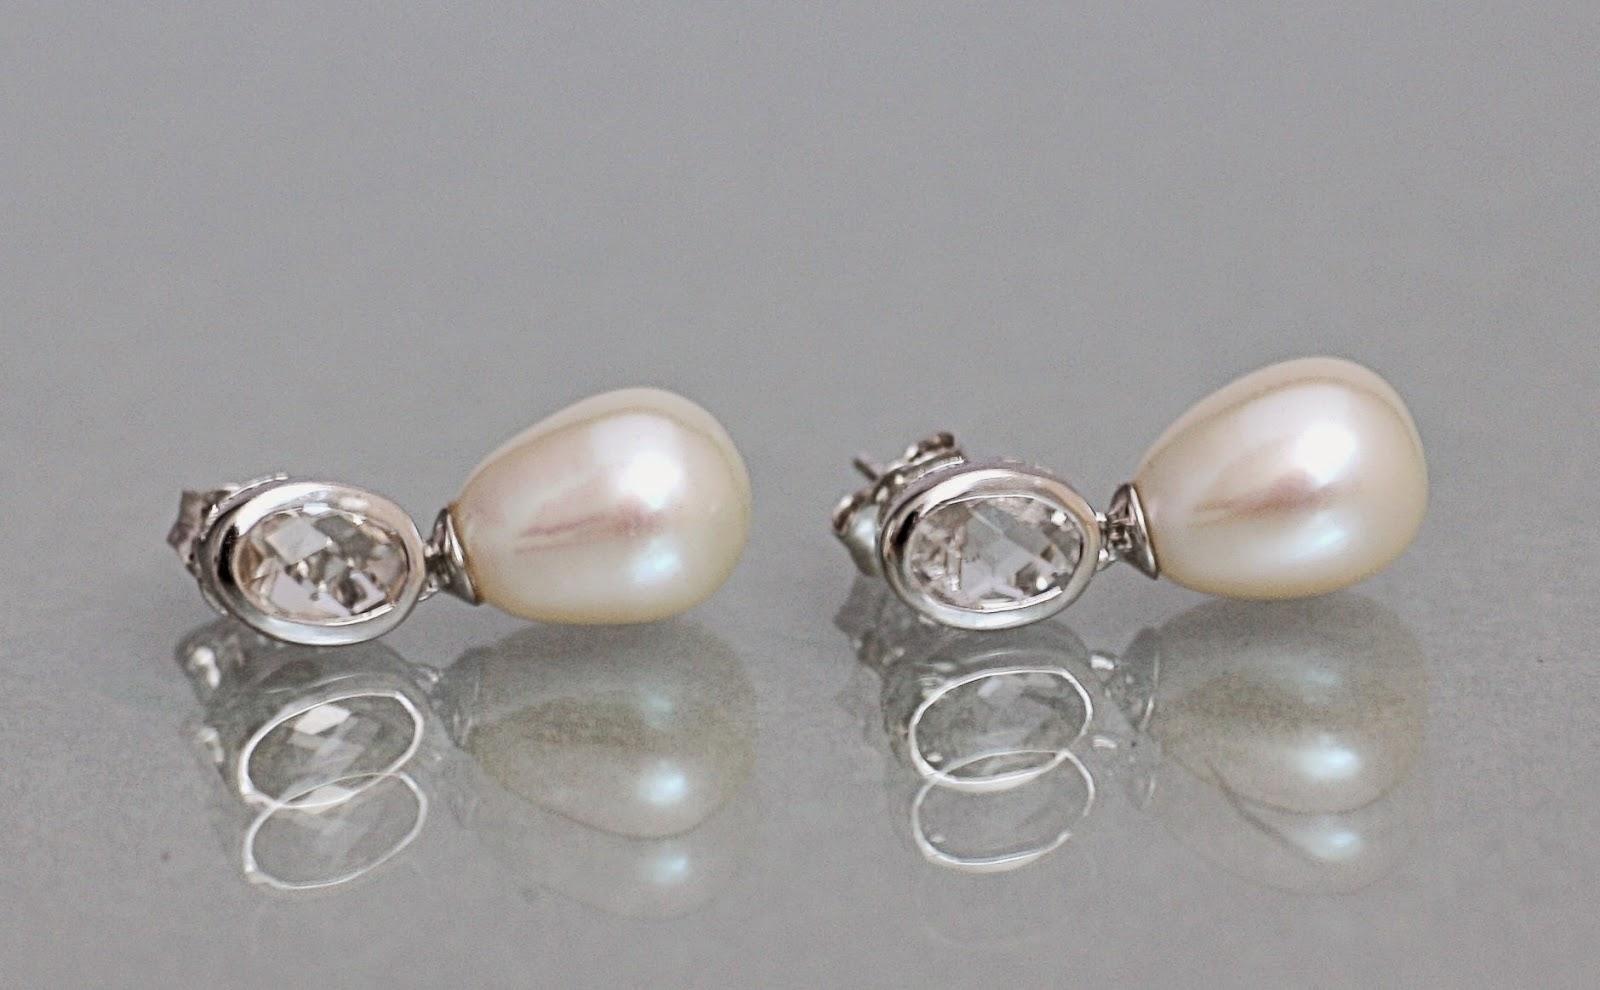 Perlenohrringe  Zuchtperlen in Farbe: PERLEN OHRRINGE